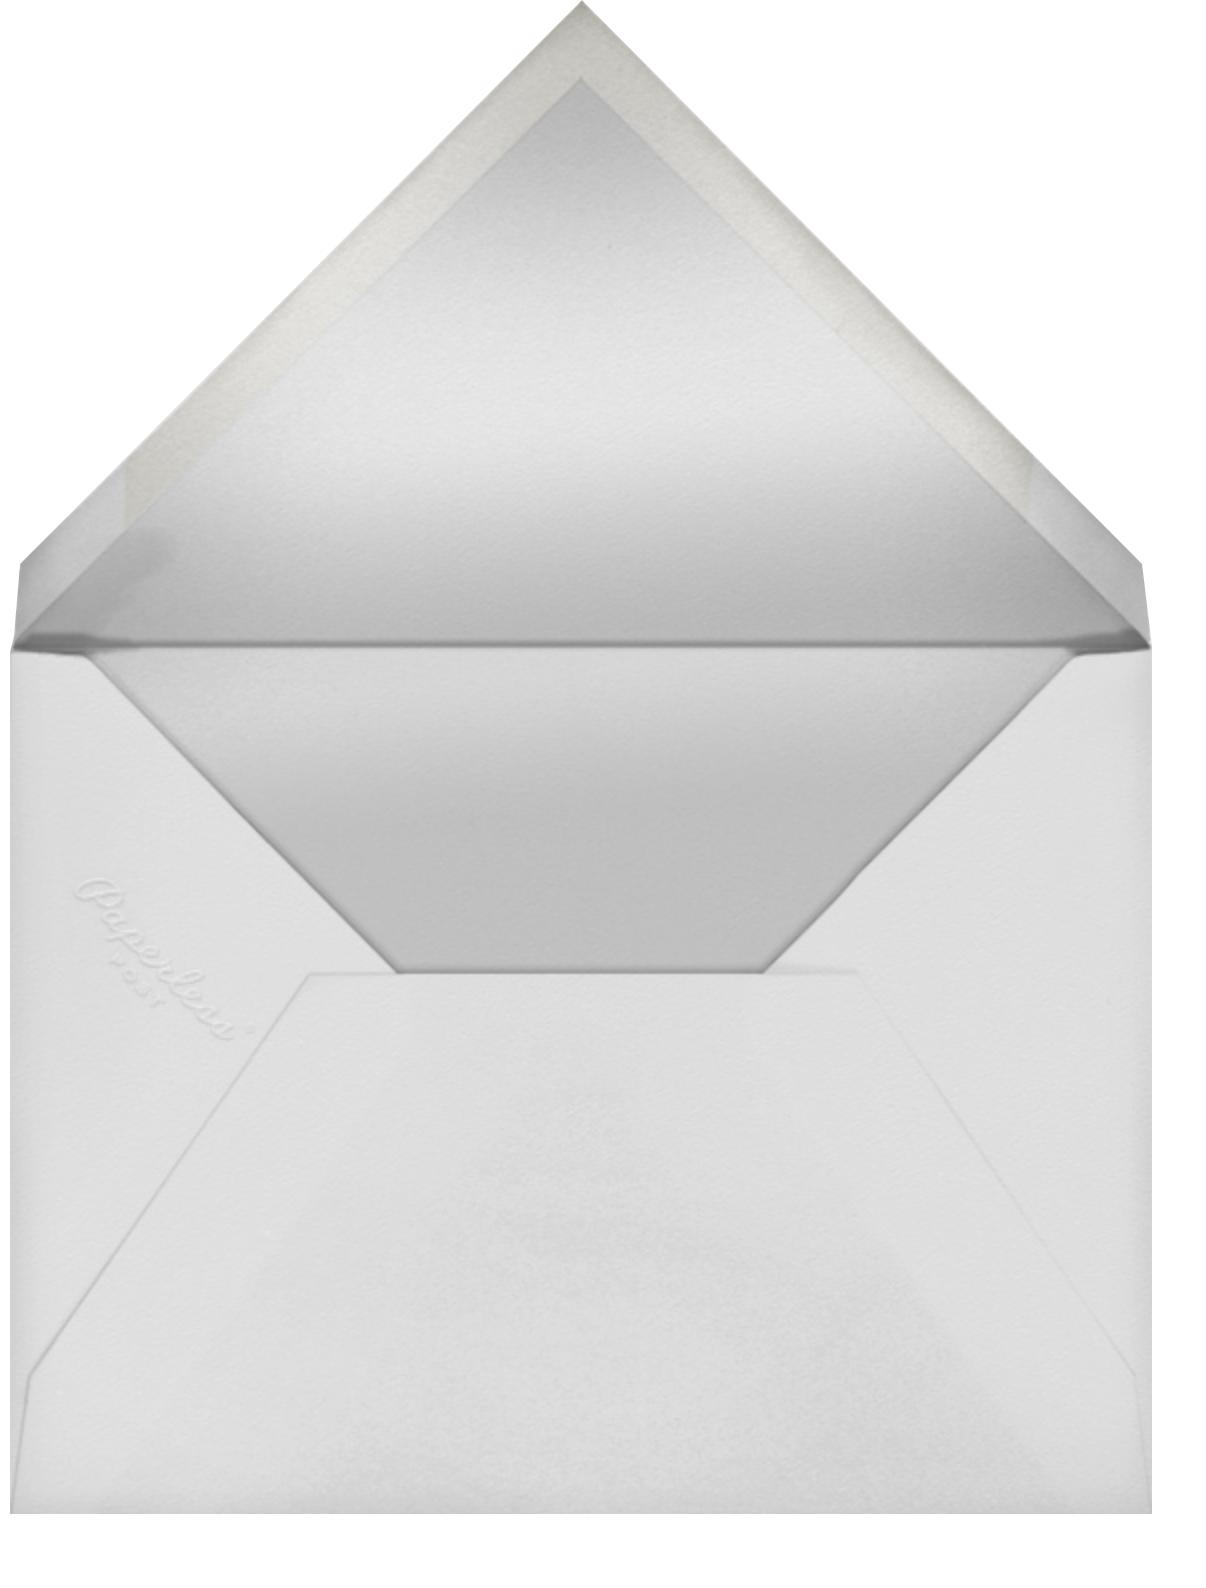 Miss Anupama (Program) - Mr. Boddington's Studio - Menus - envelope back